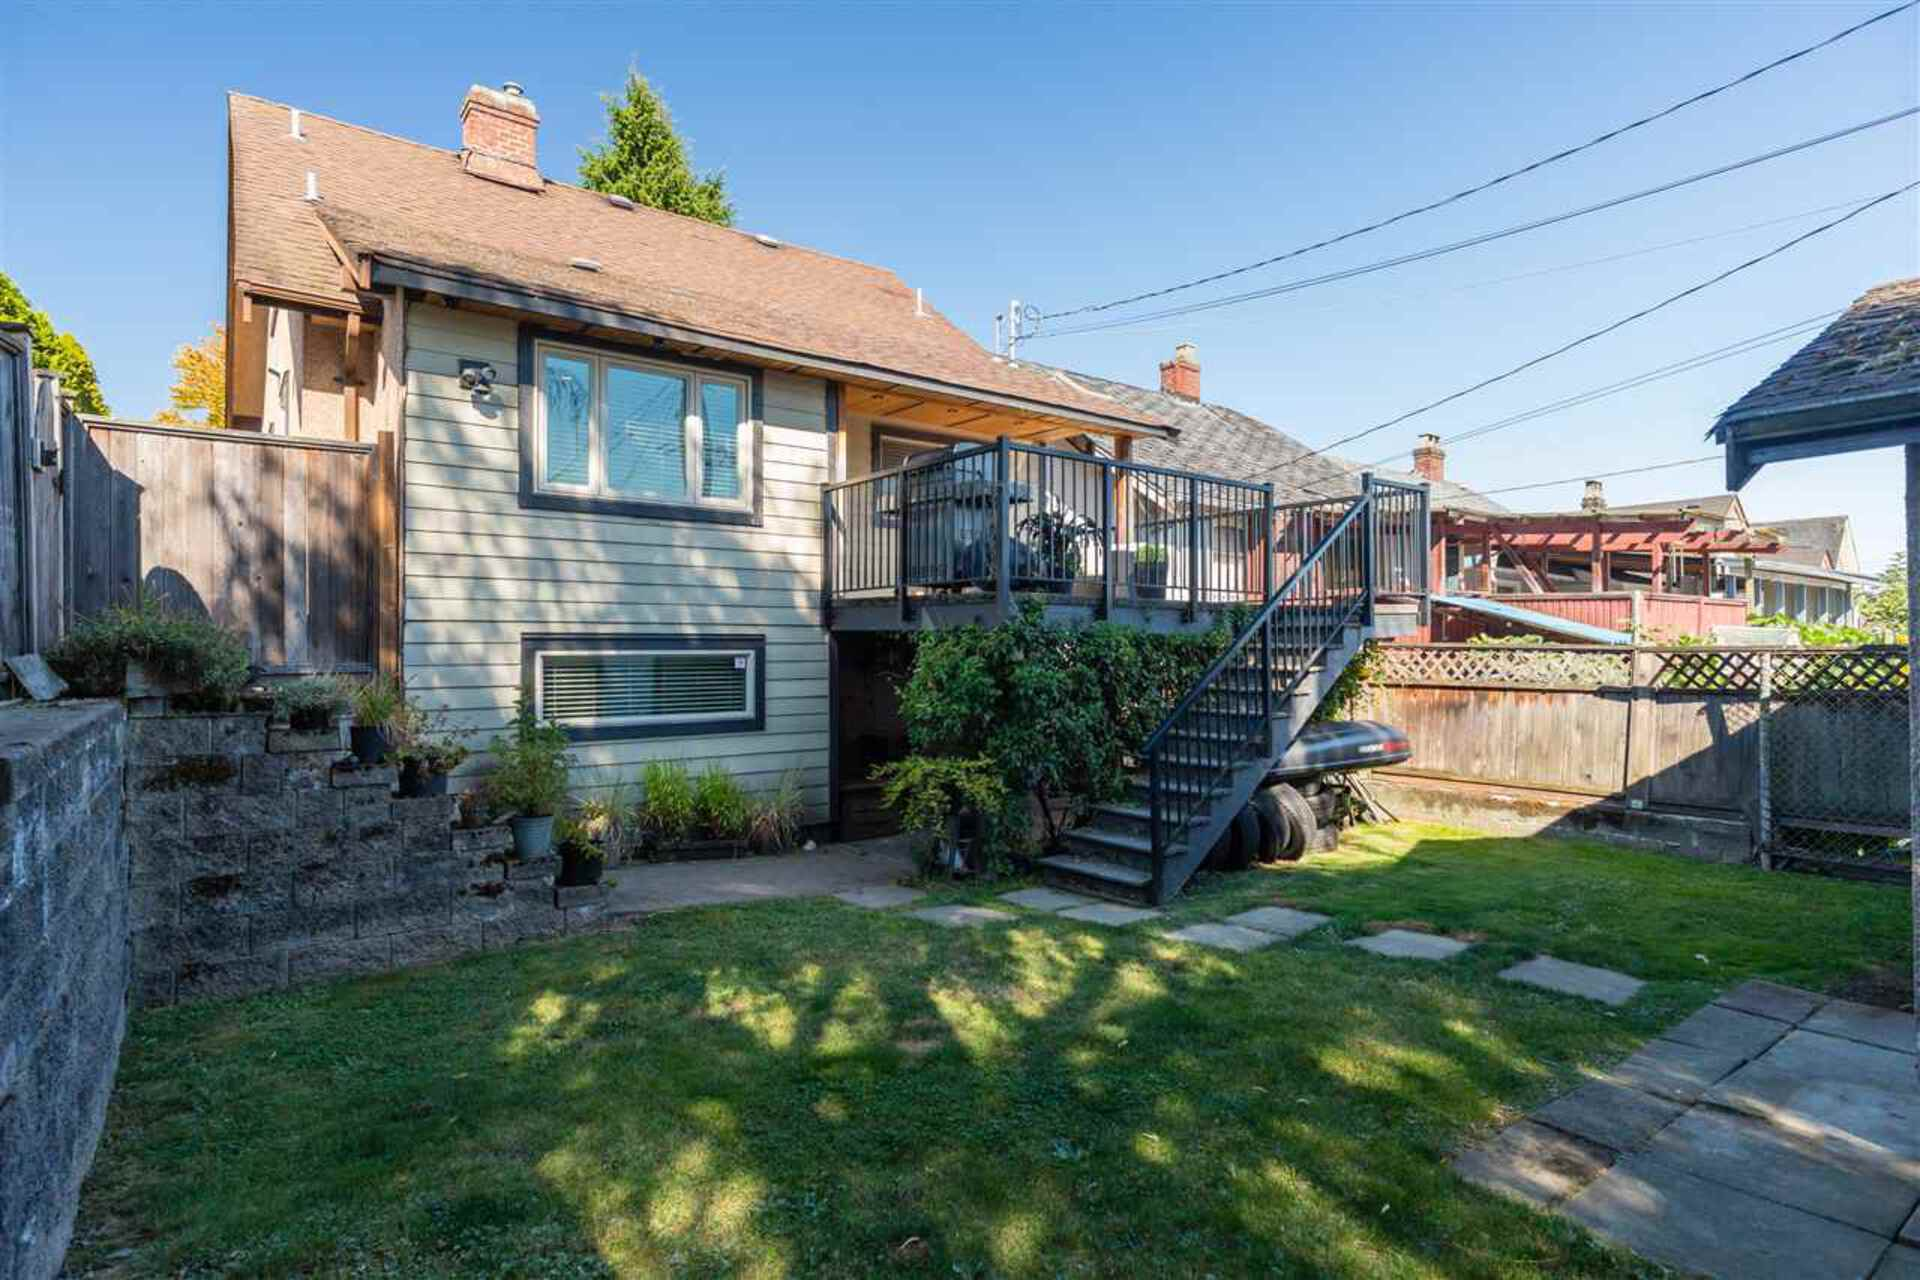 2904-turner-street-renfrew-ve-vancouver-east-26 at 2904 Turner Street, Renfrew VE, Vancouver East